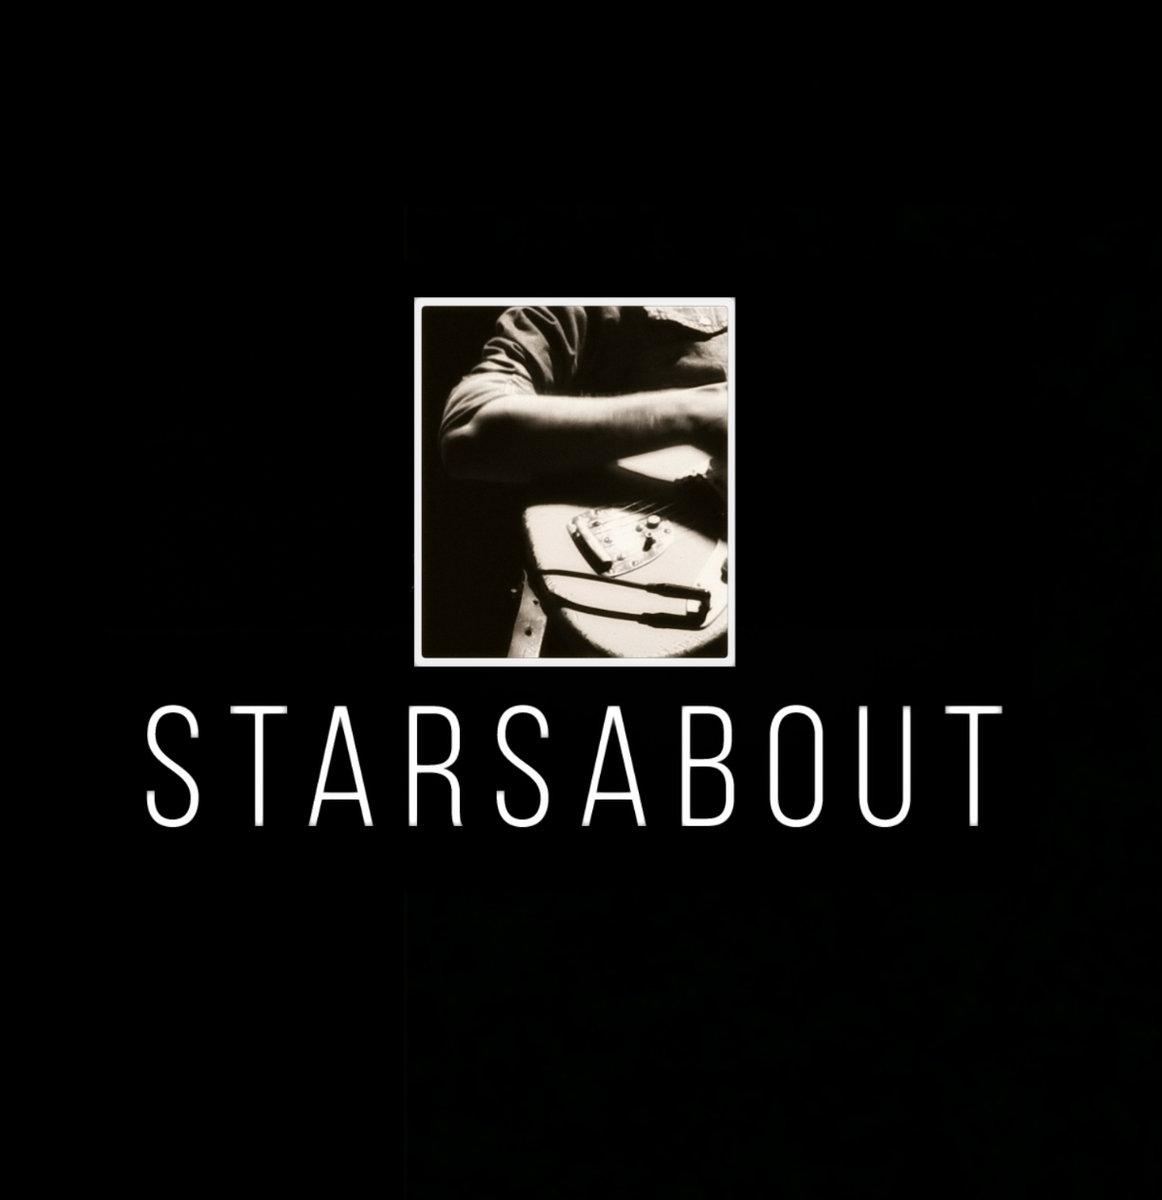 Starsabout